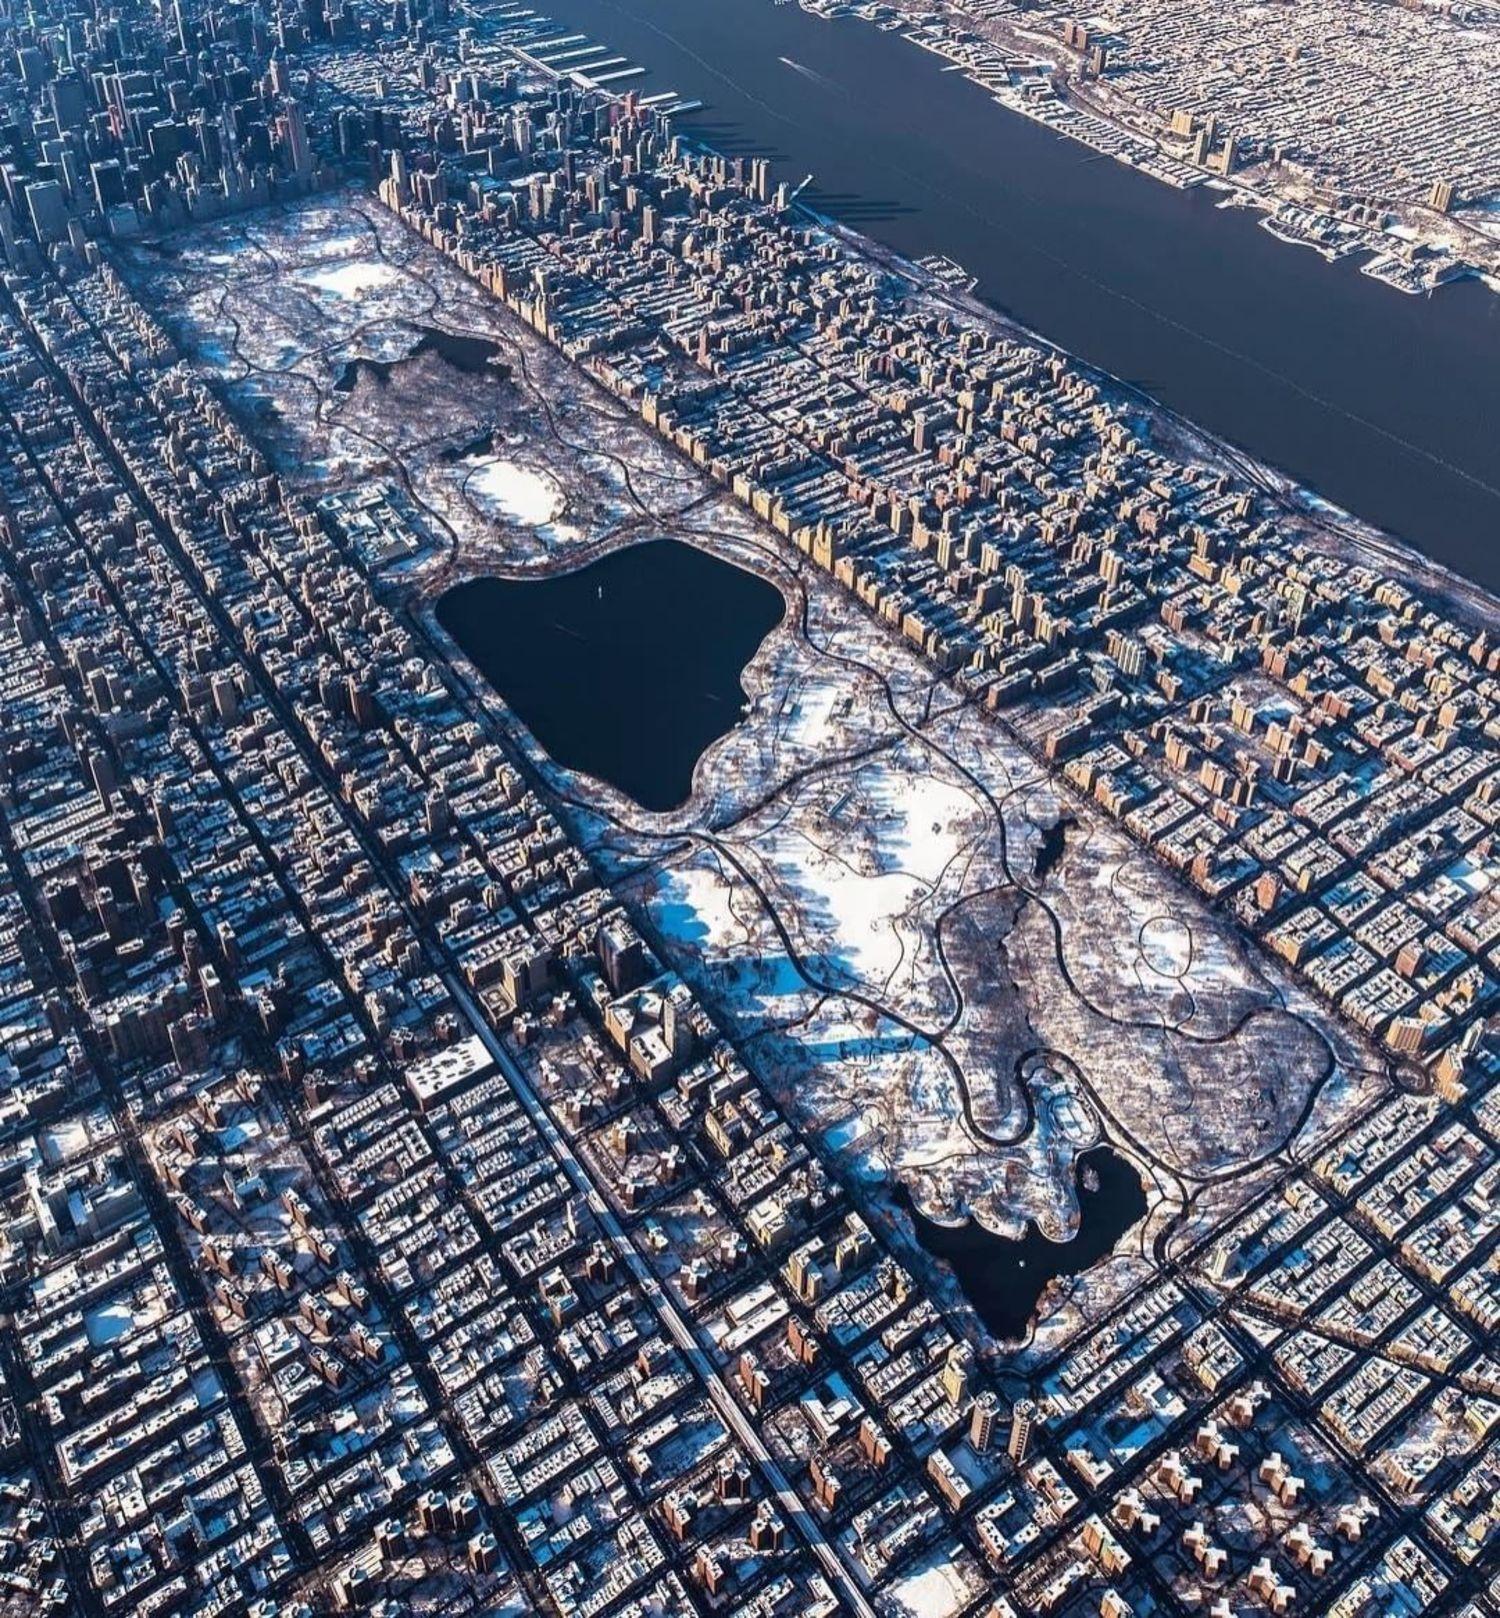 Snow-covered Central Park, New York, New York